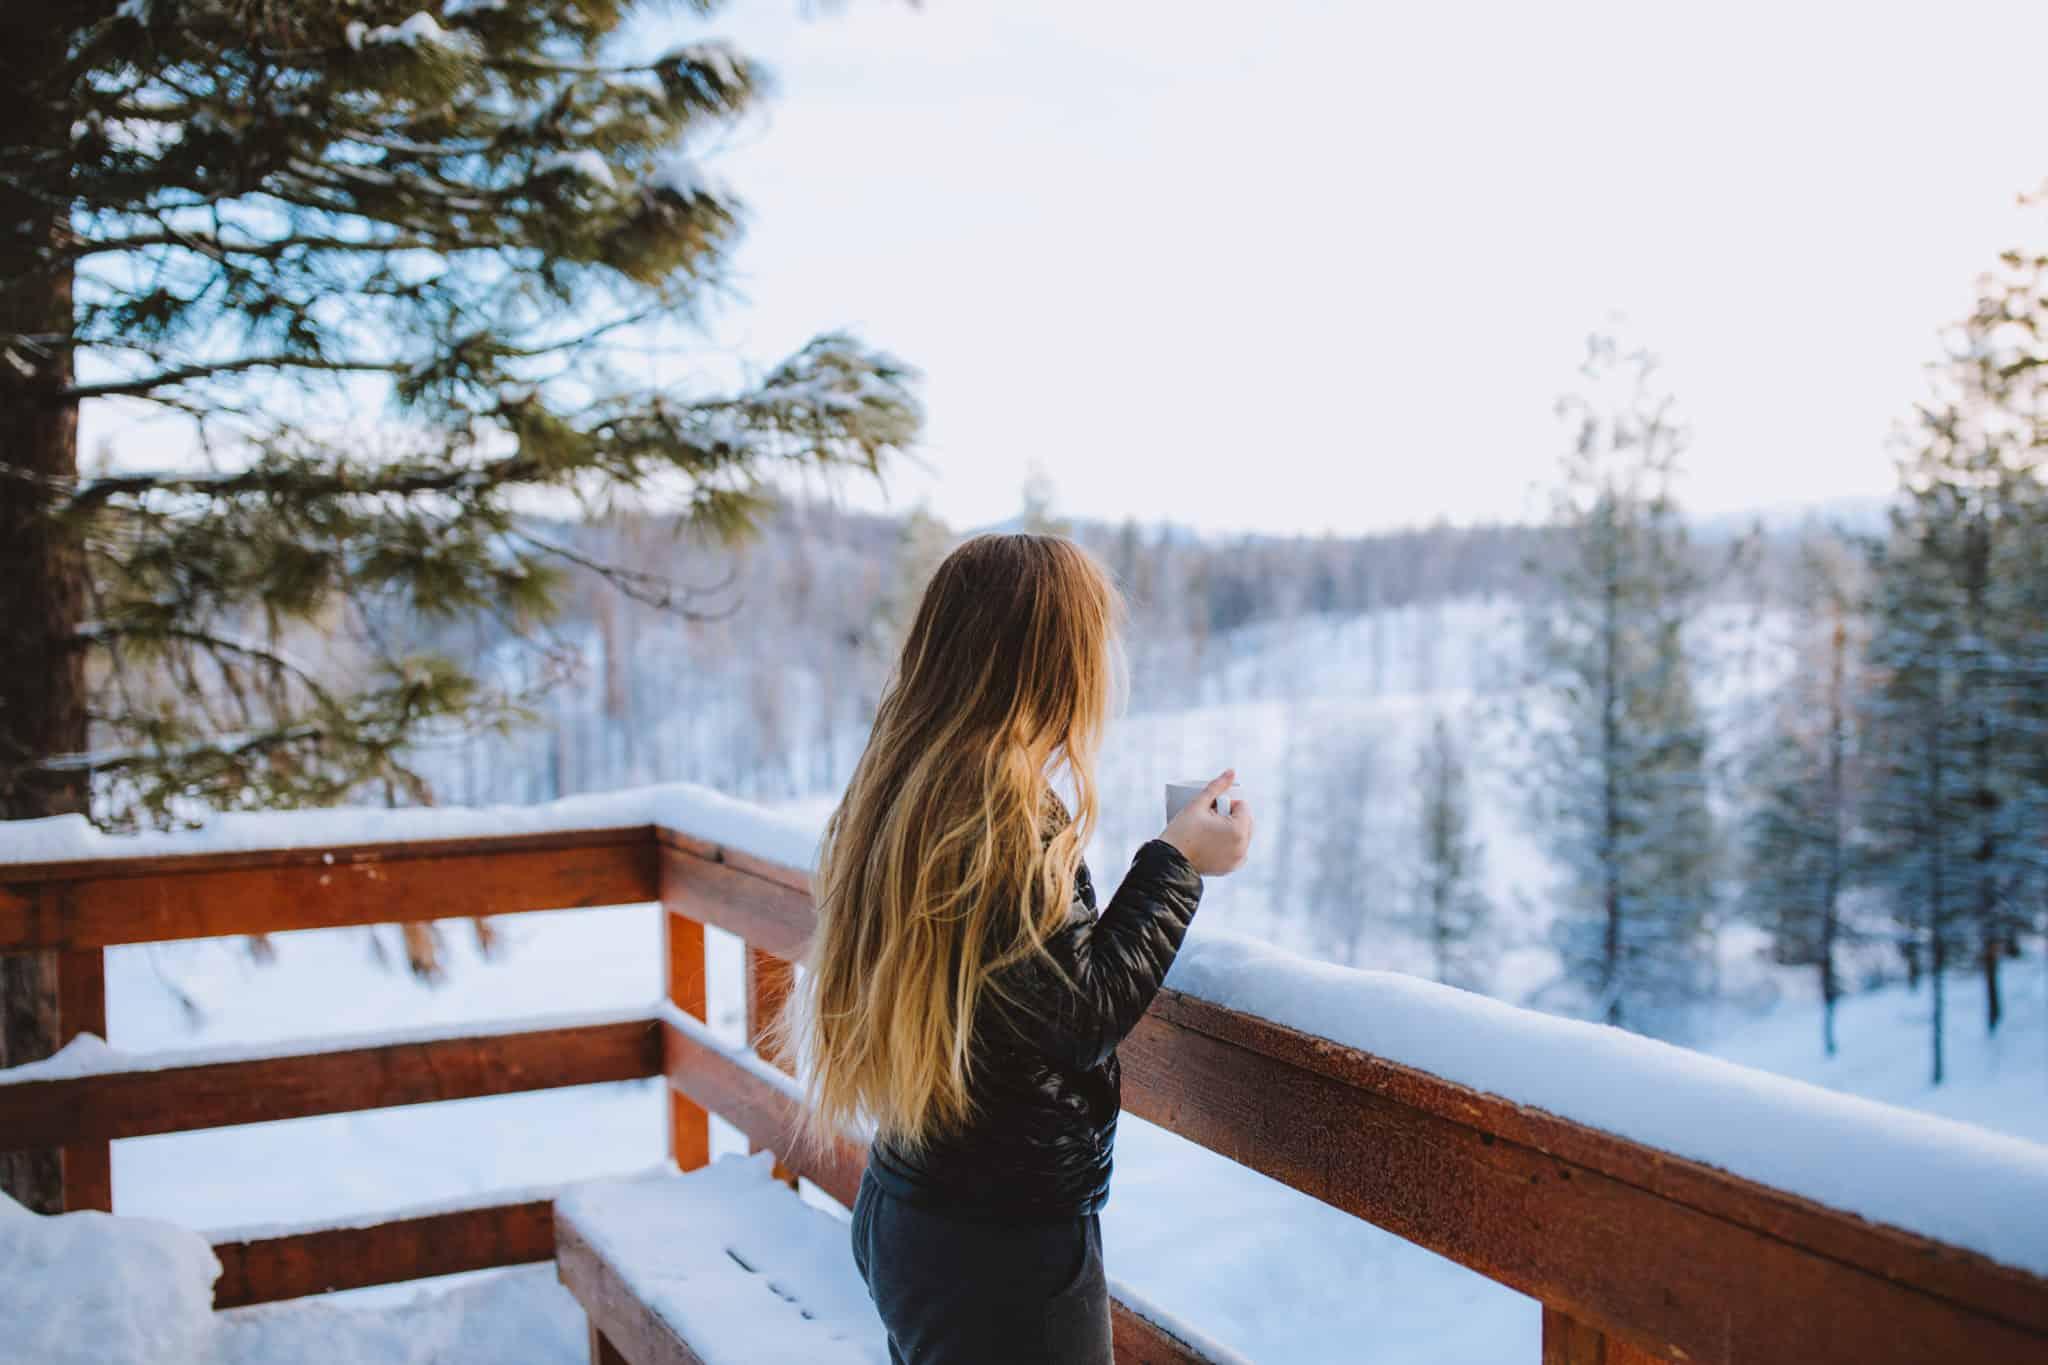 Emily standing on yurt deck drinking coffee